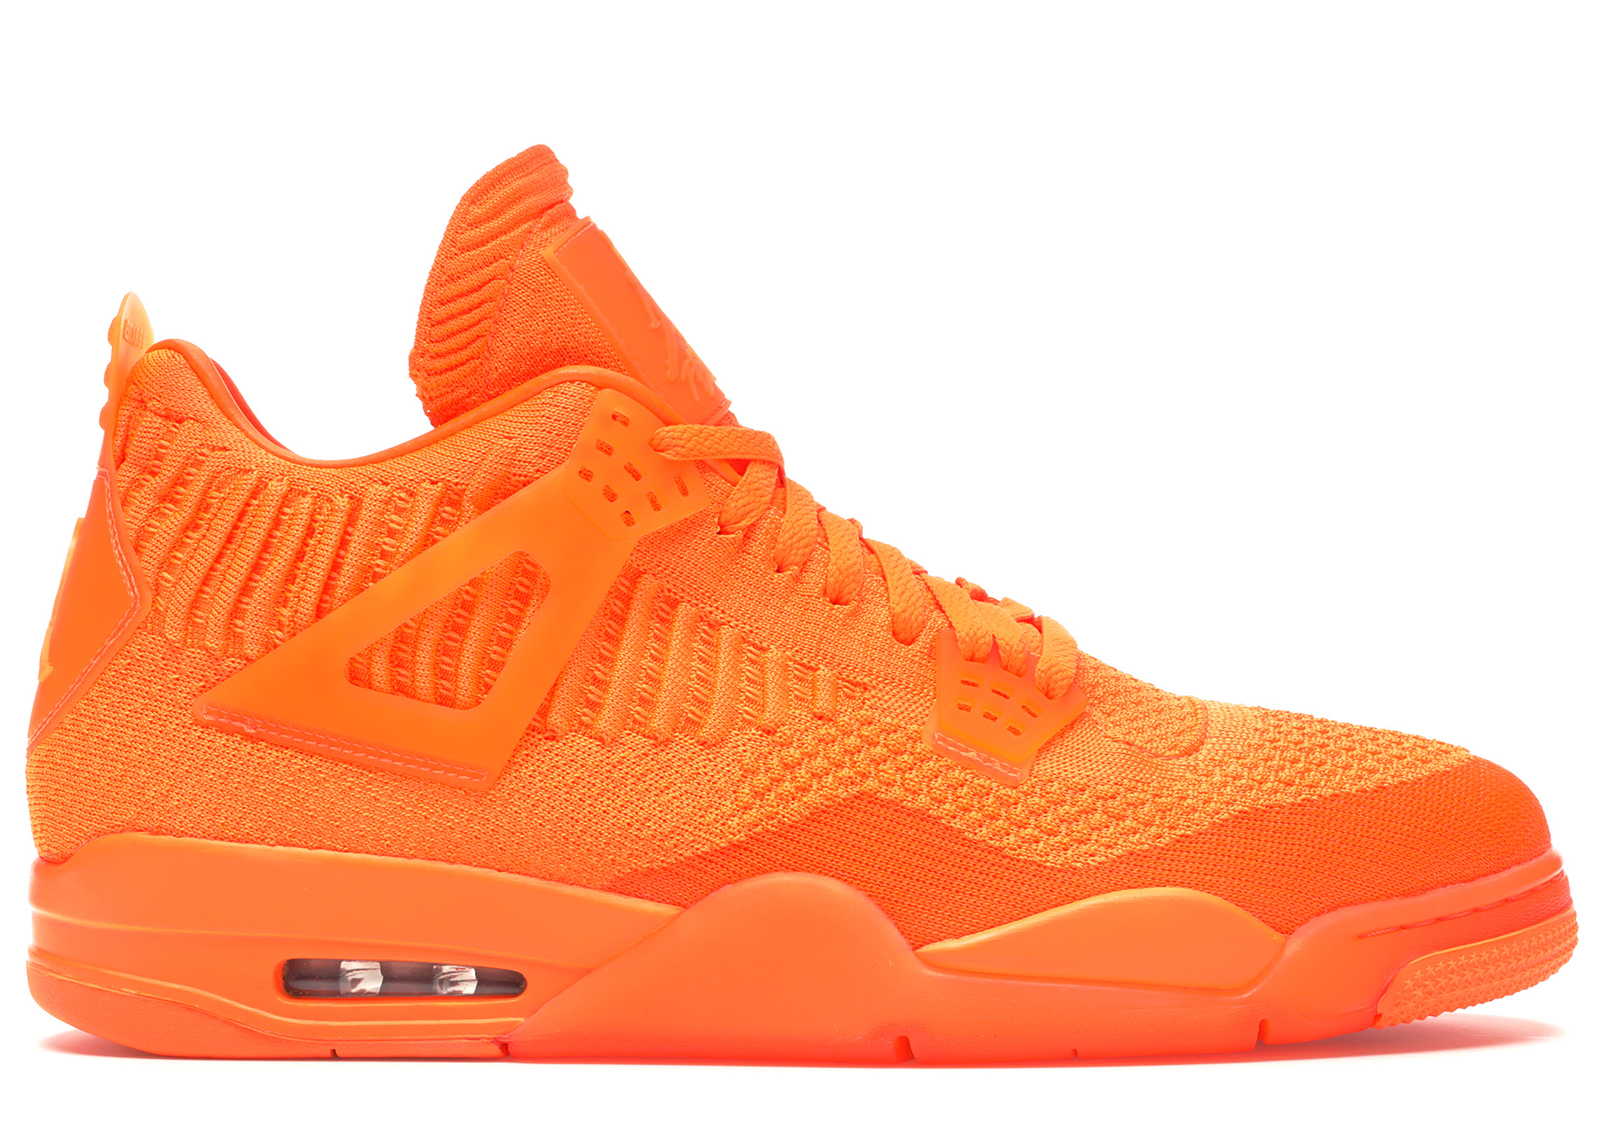 Jordan 4 Retro Flyknit Orange